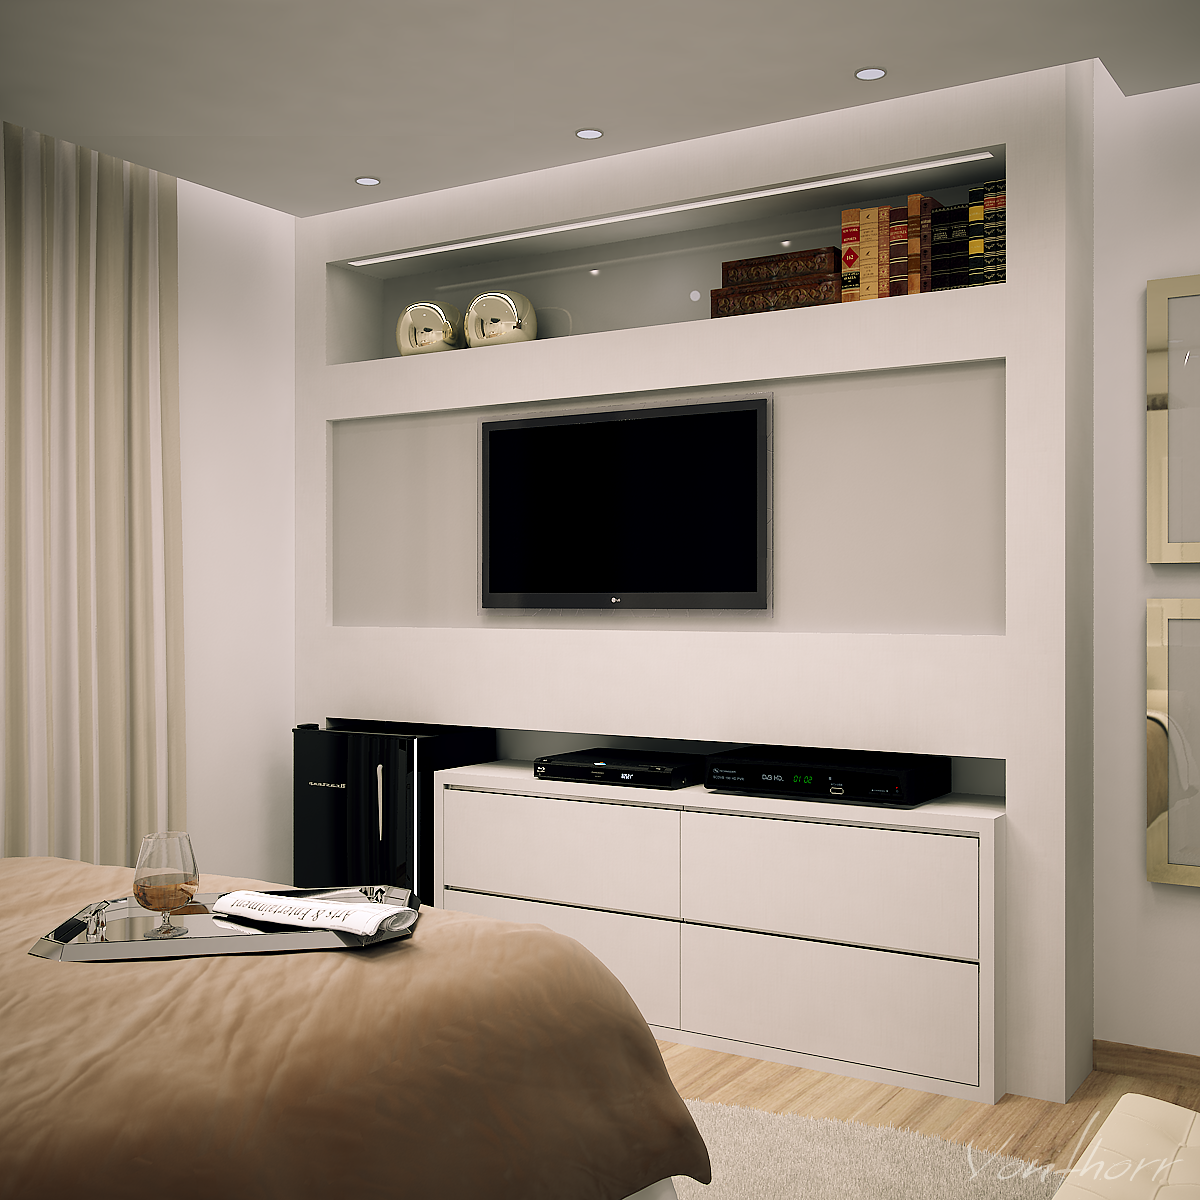 Danis Bedroom by vonthorr